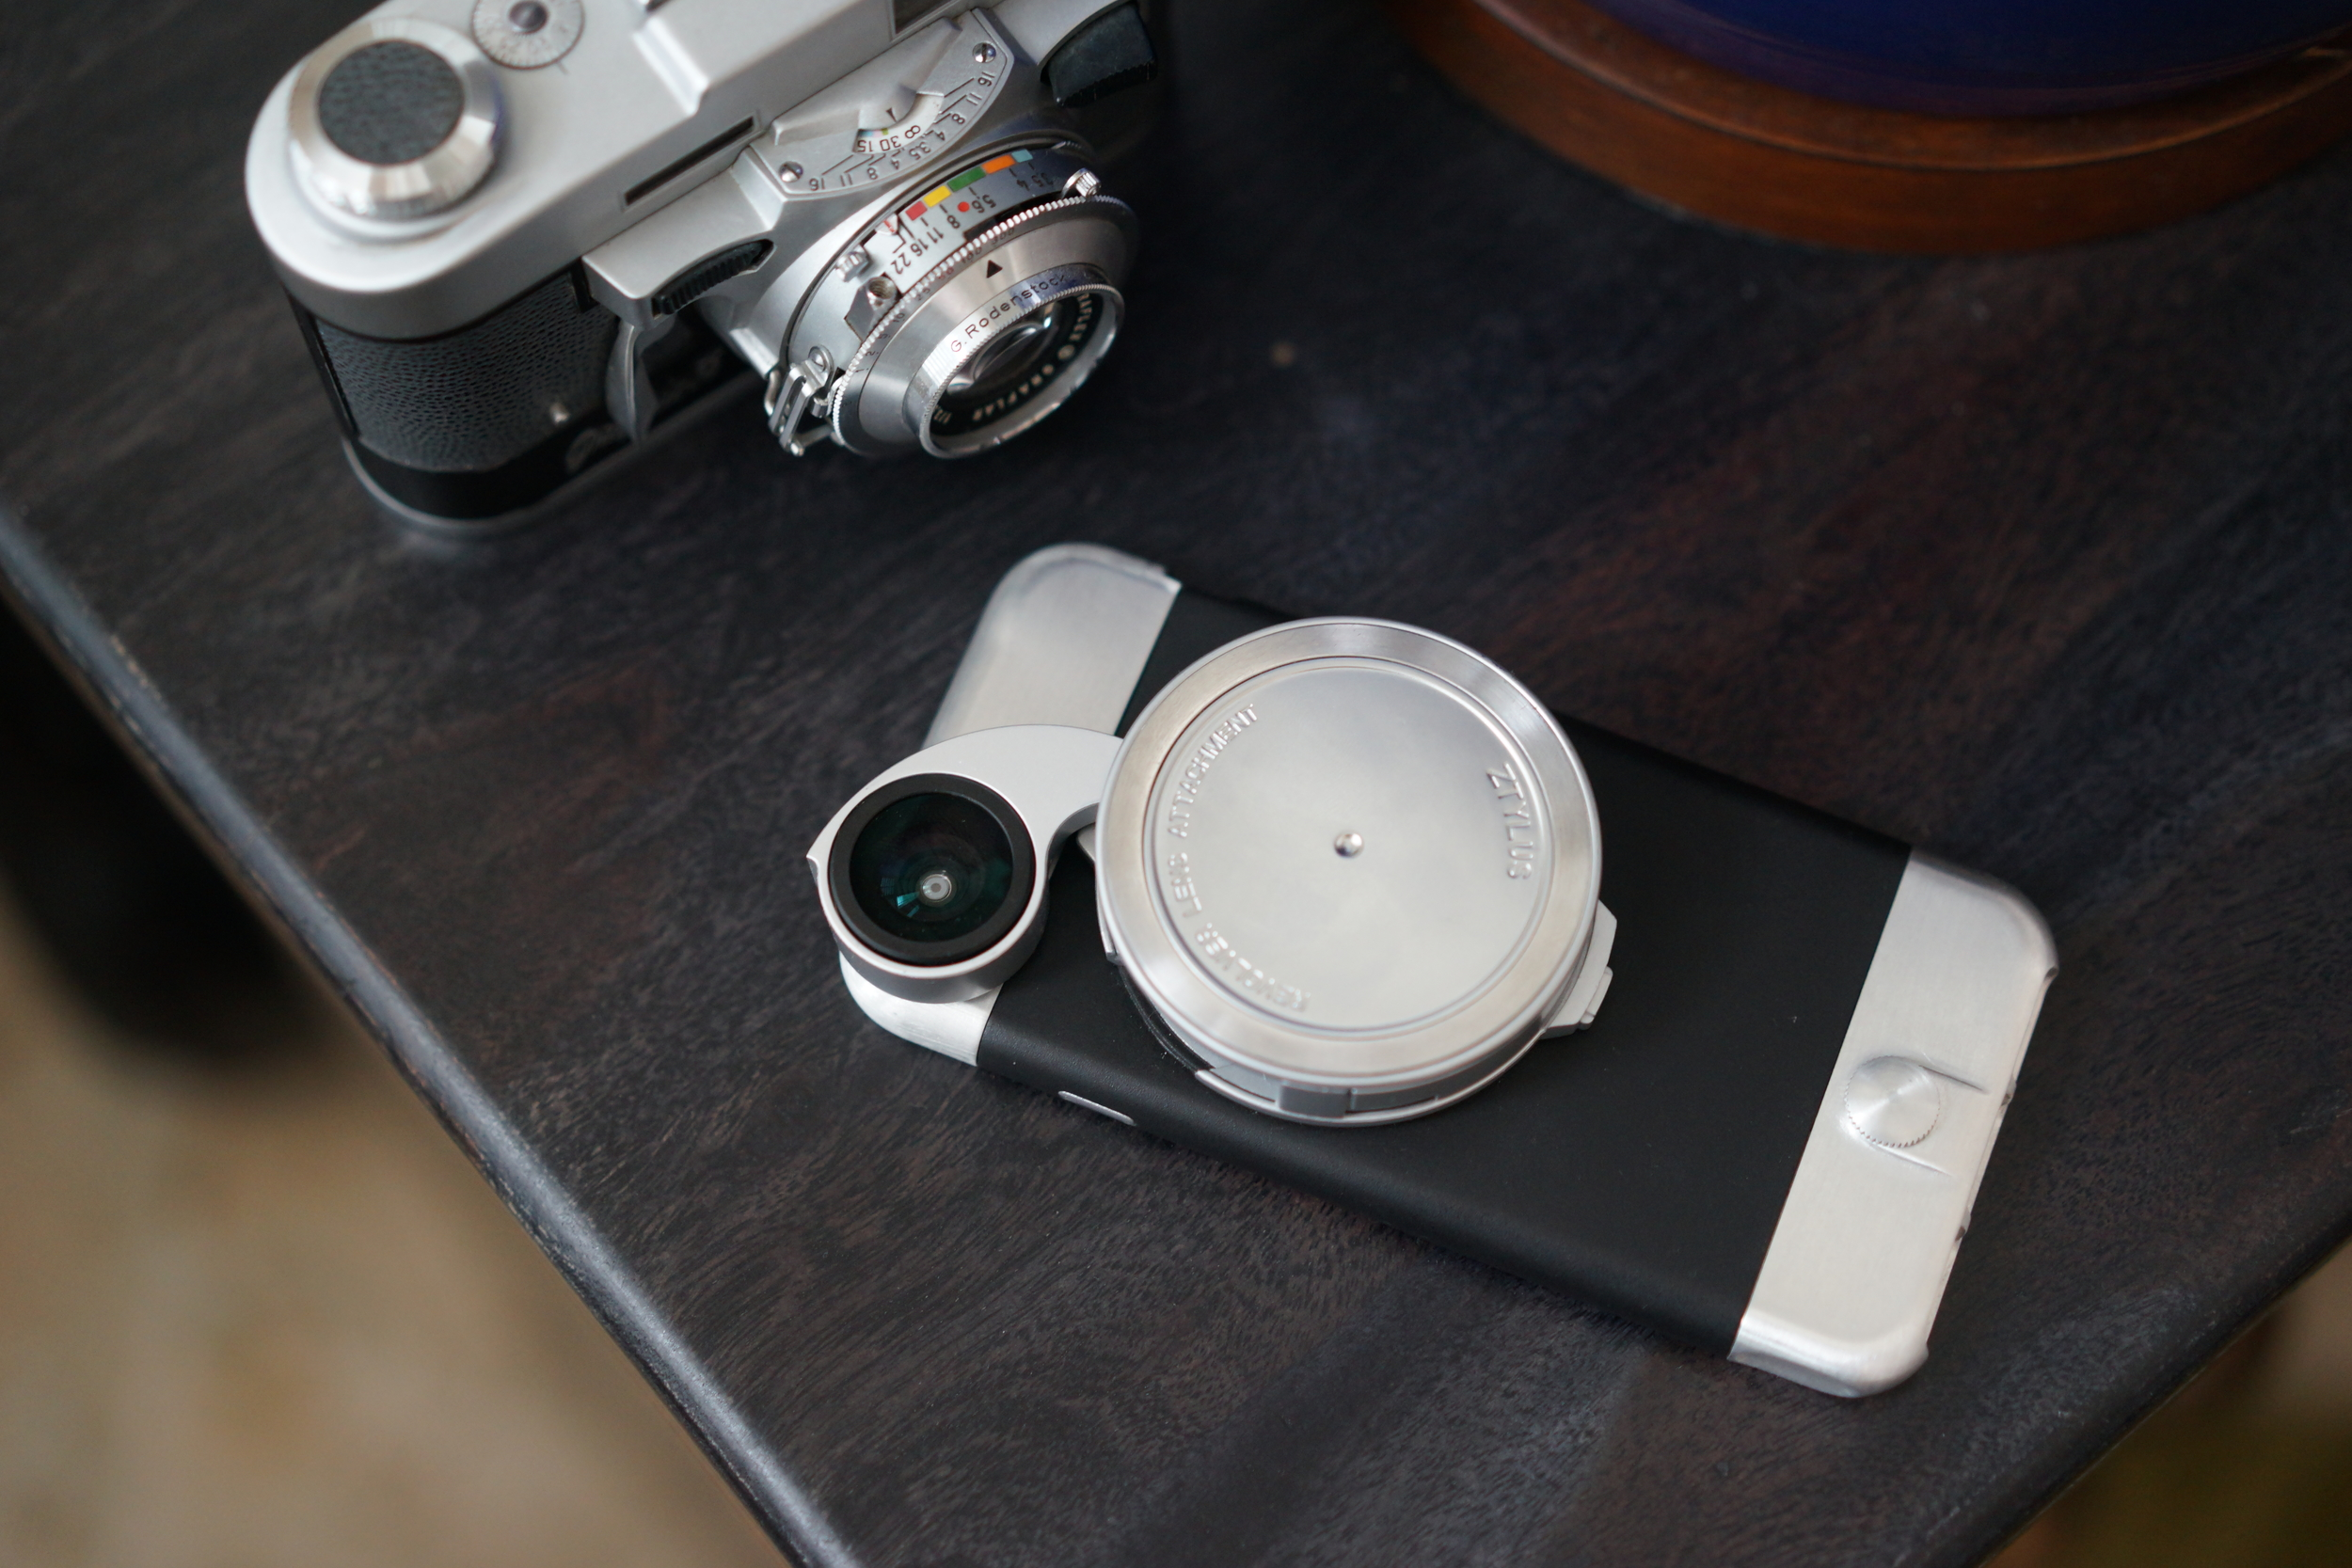 Ztylus iPhone 6 Premium w RV2 Retro.JPG